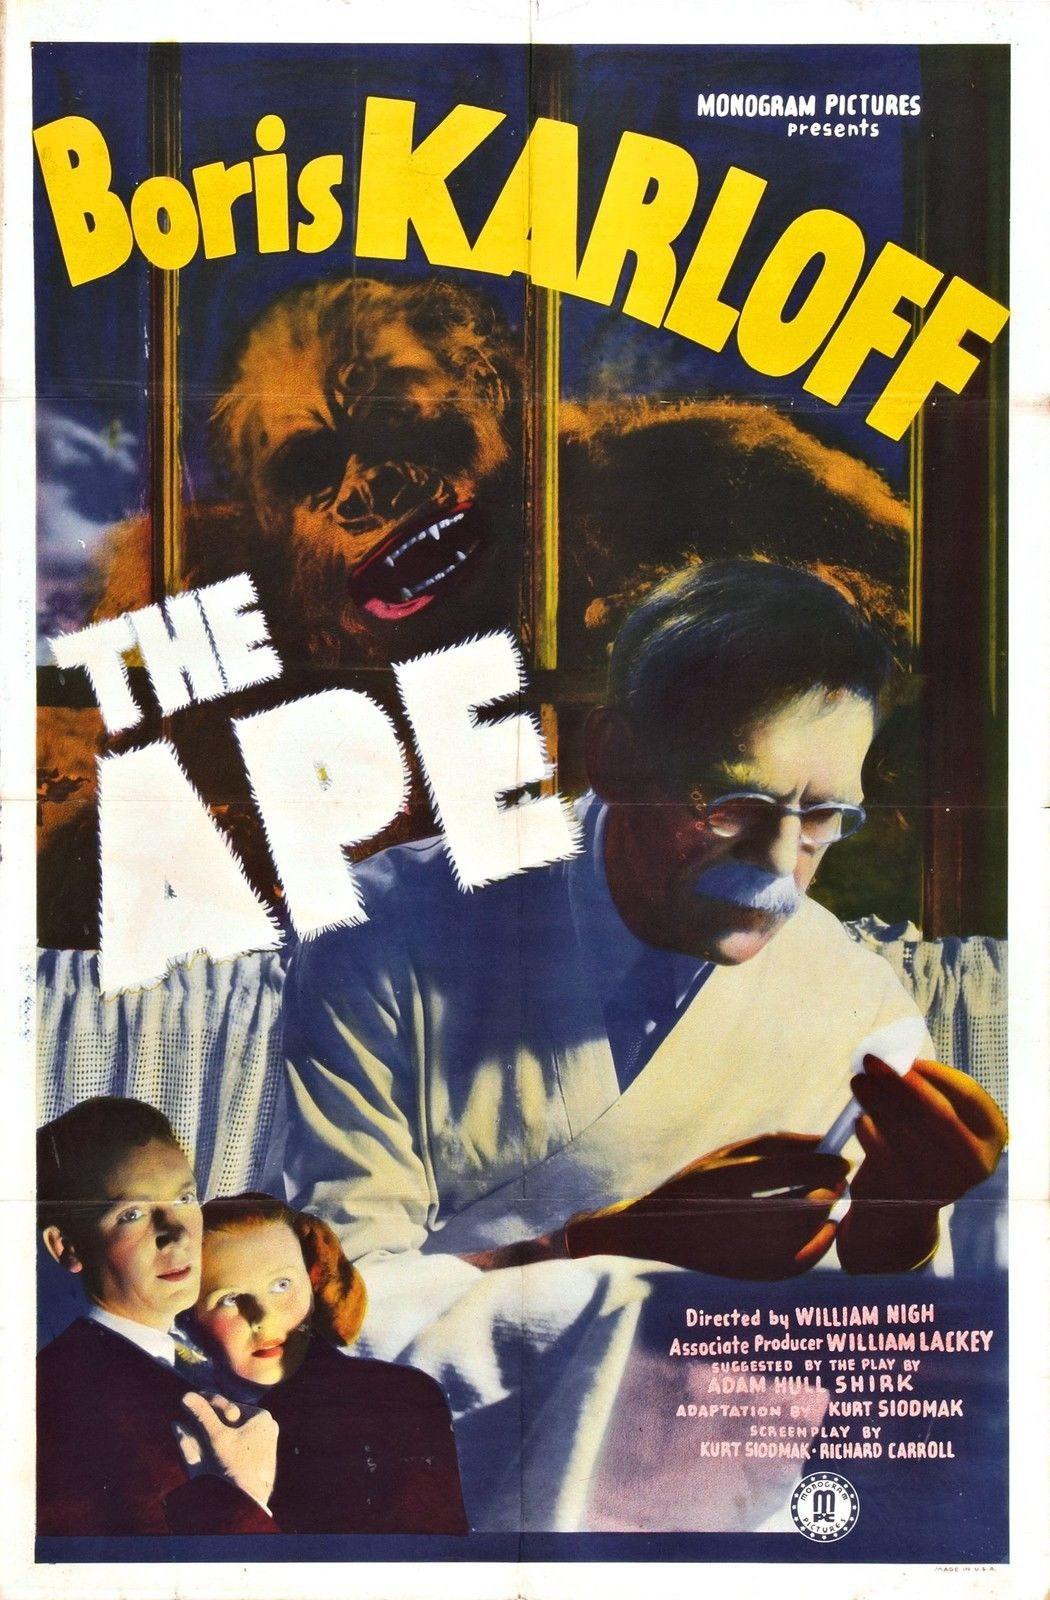 74054 THE APE 1940 Boris Karloff Universal Monster Wall Print Poster Affiche